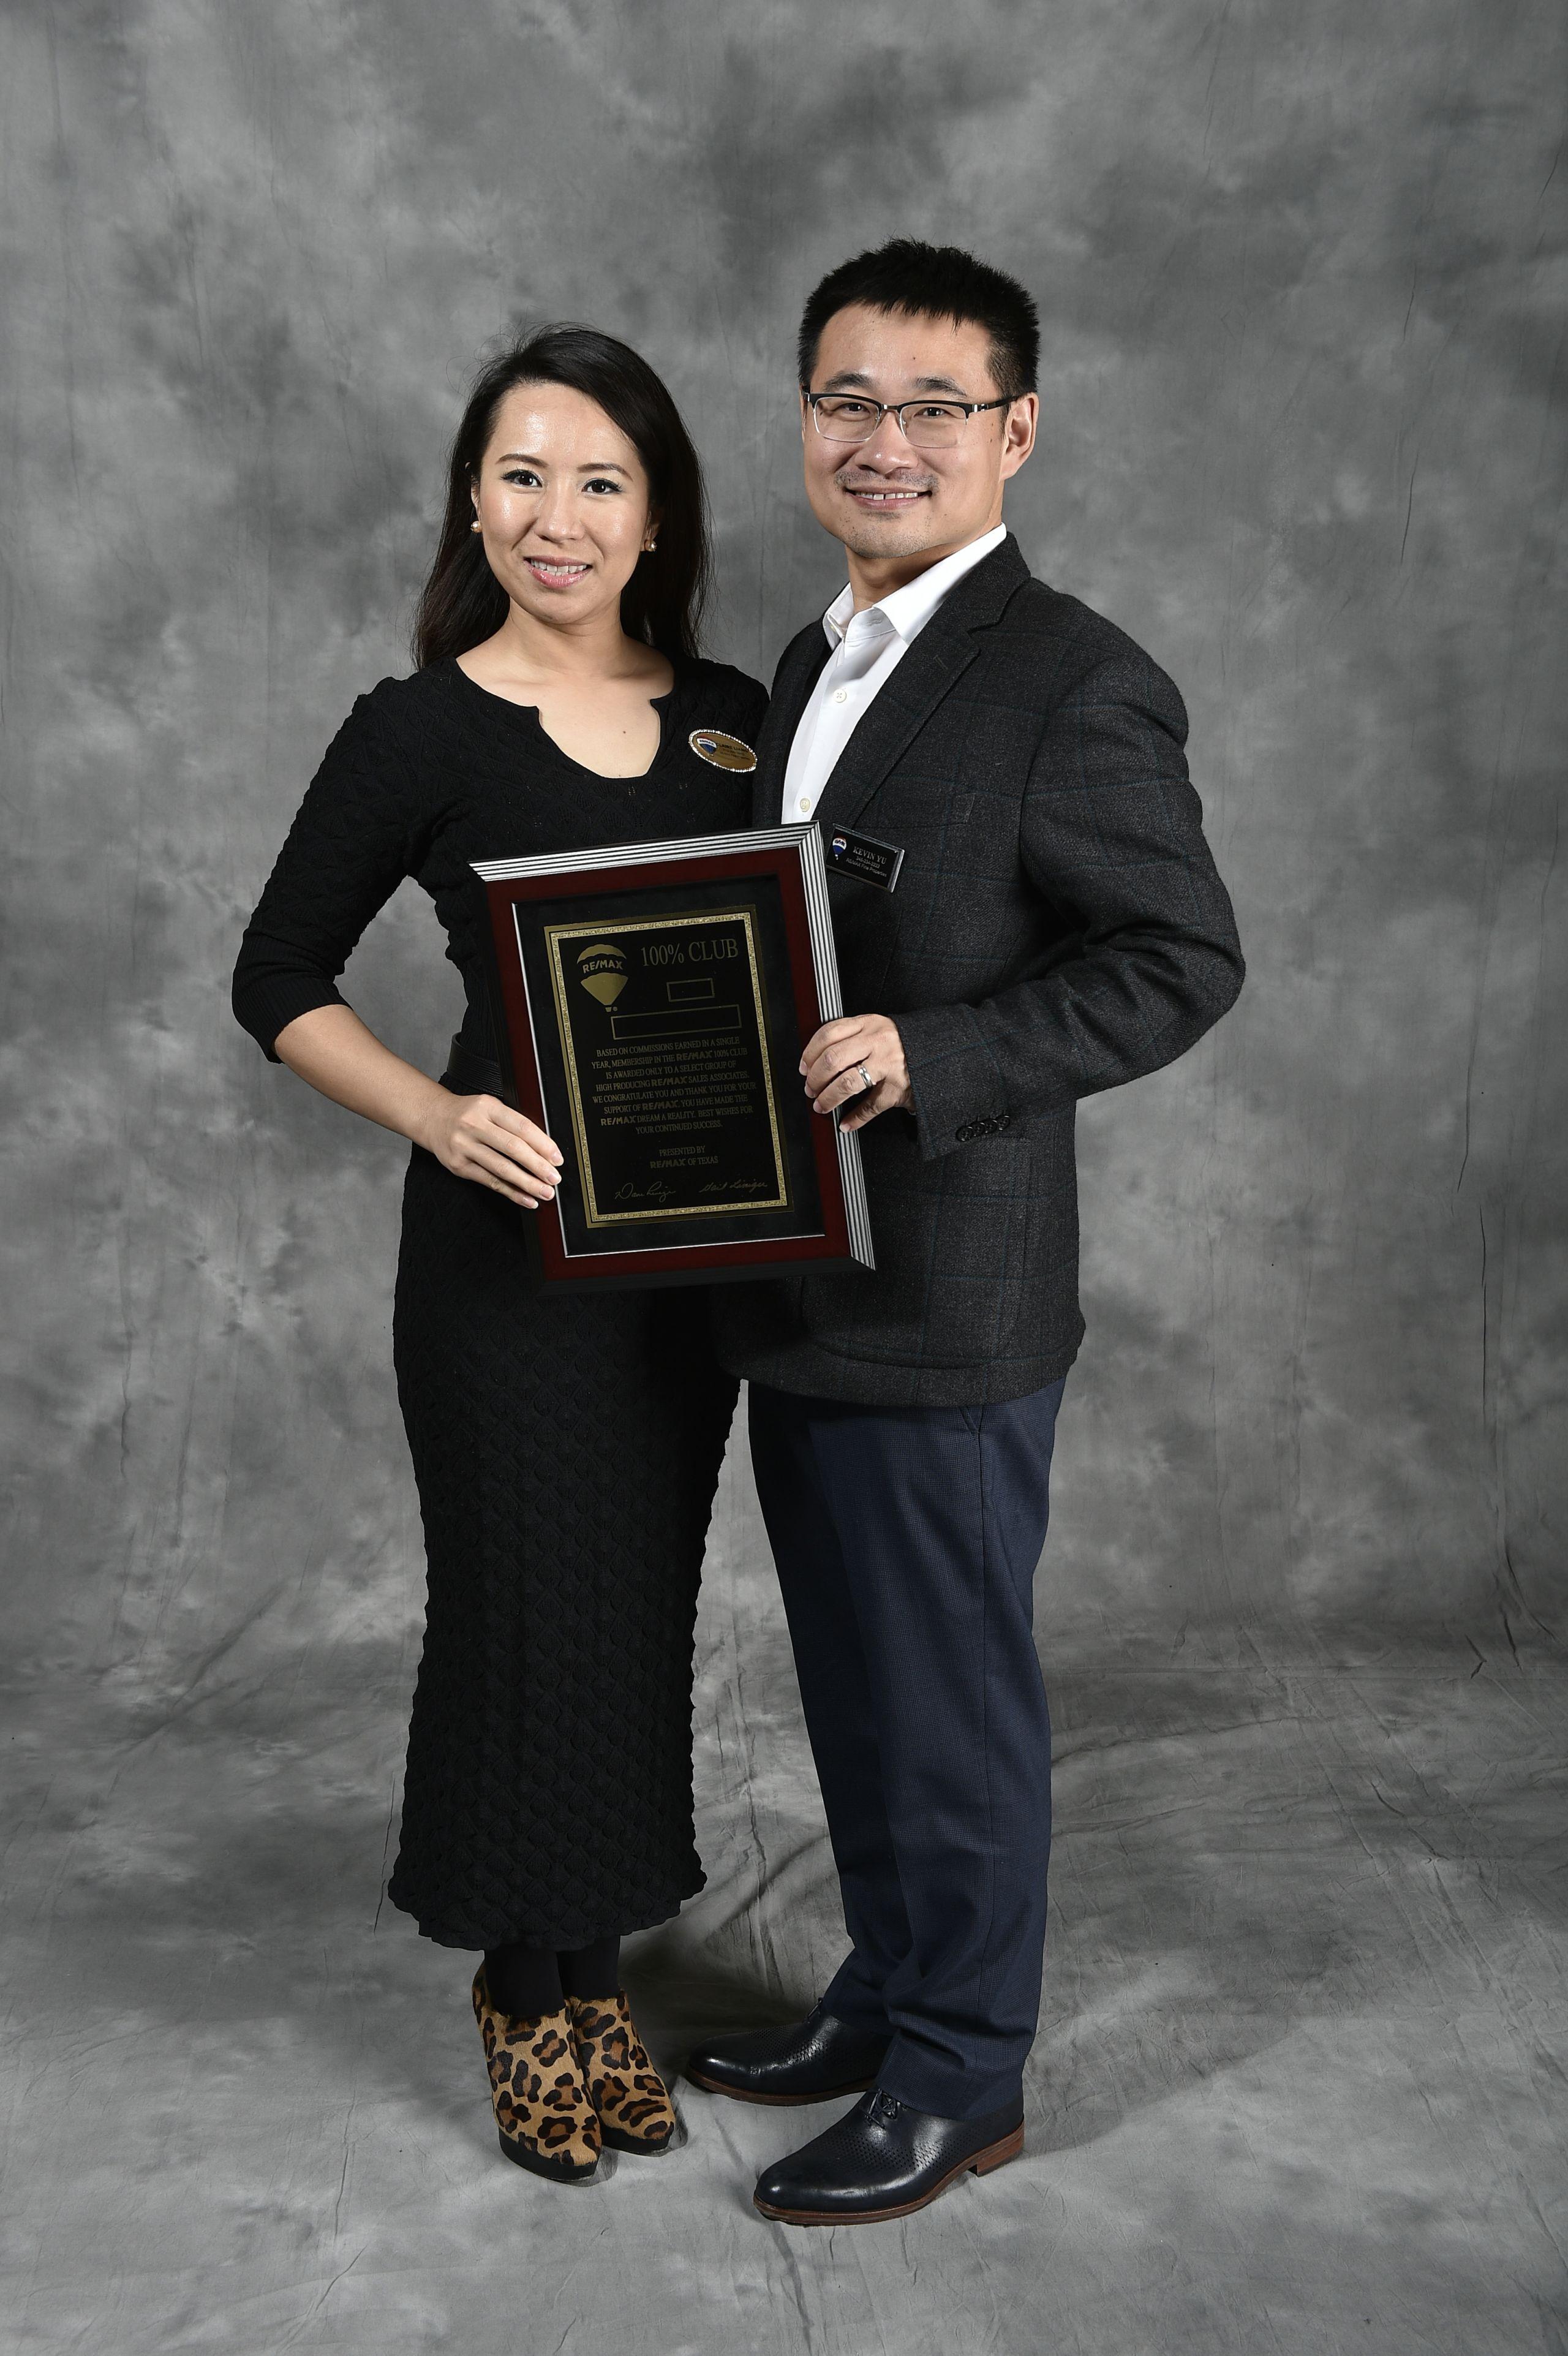 Earning Awards